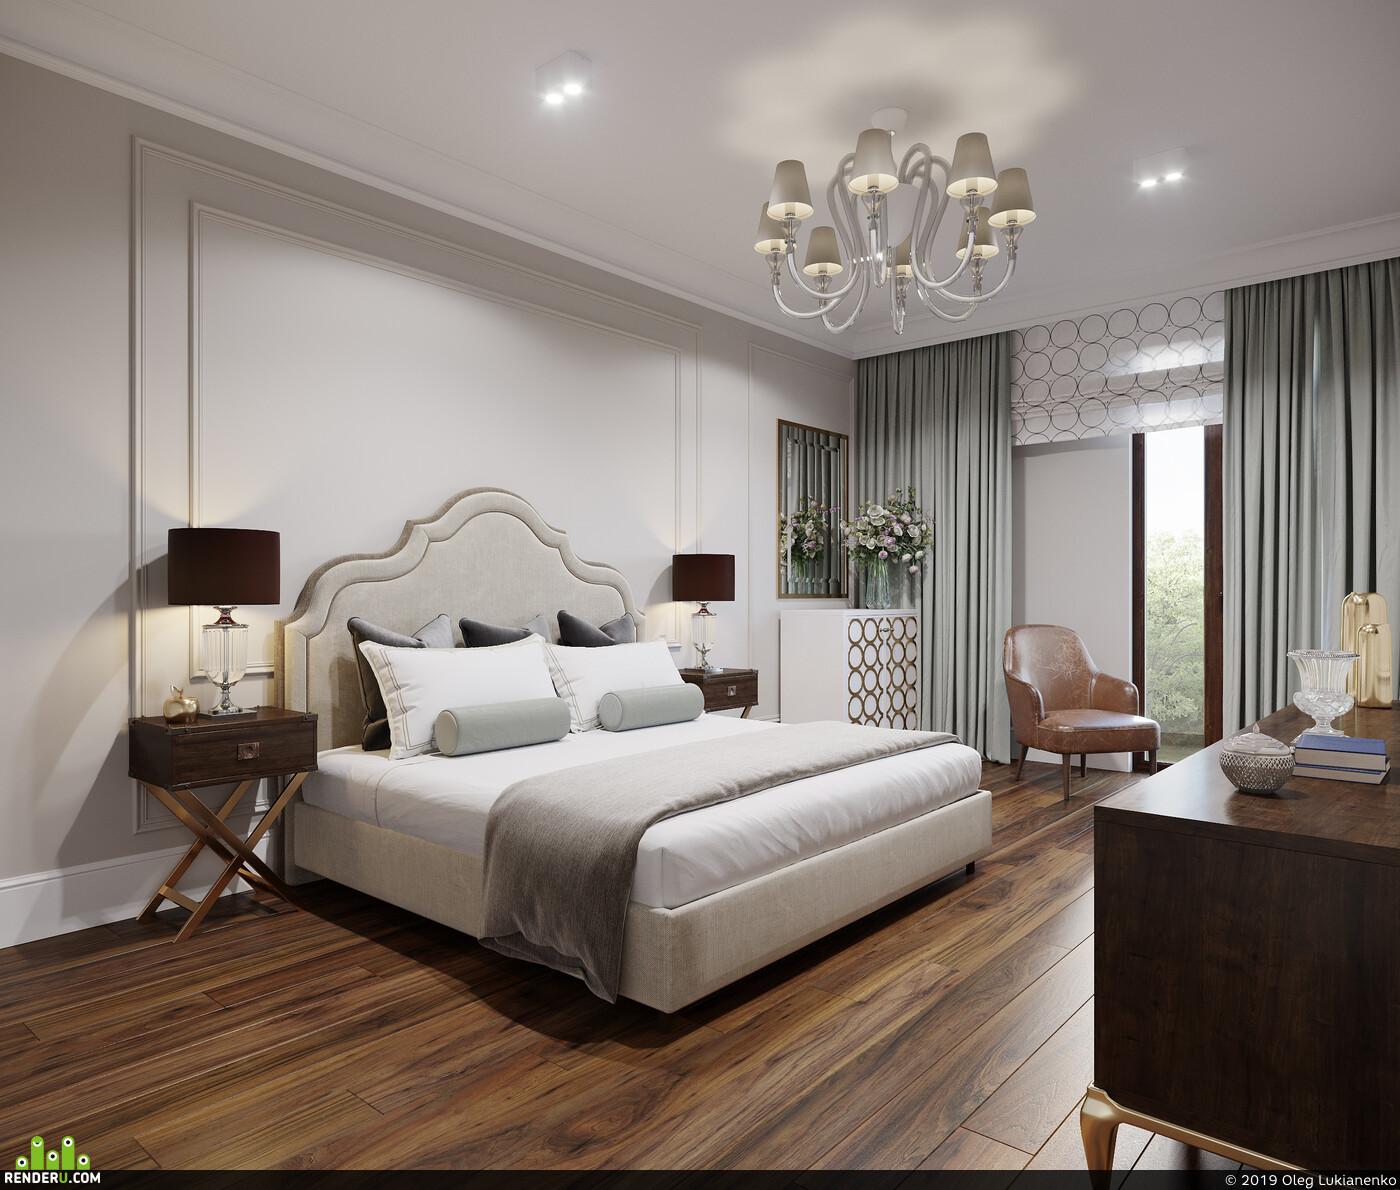 Спальня, дикарт, классика, синий, лепнина, 3dsmax, 3dmax, corona, ps, moscow, dicart